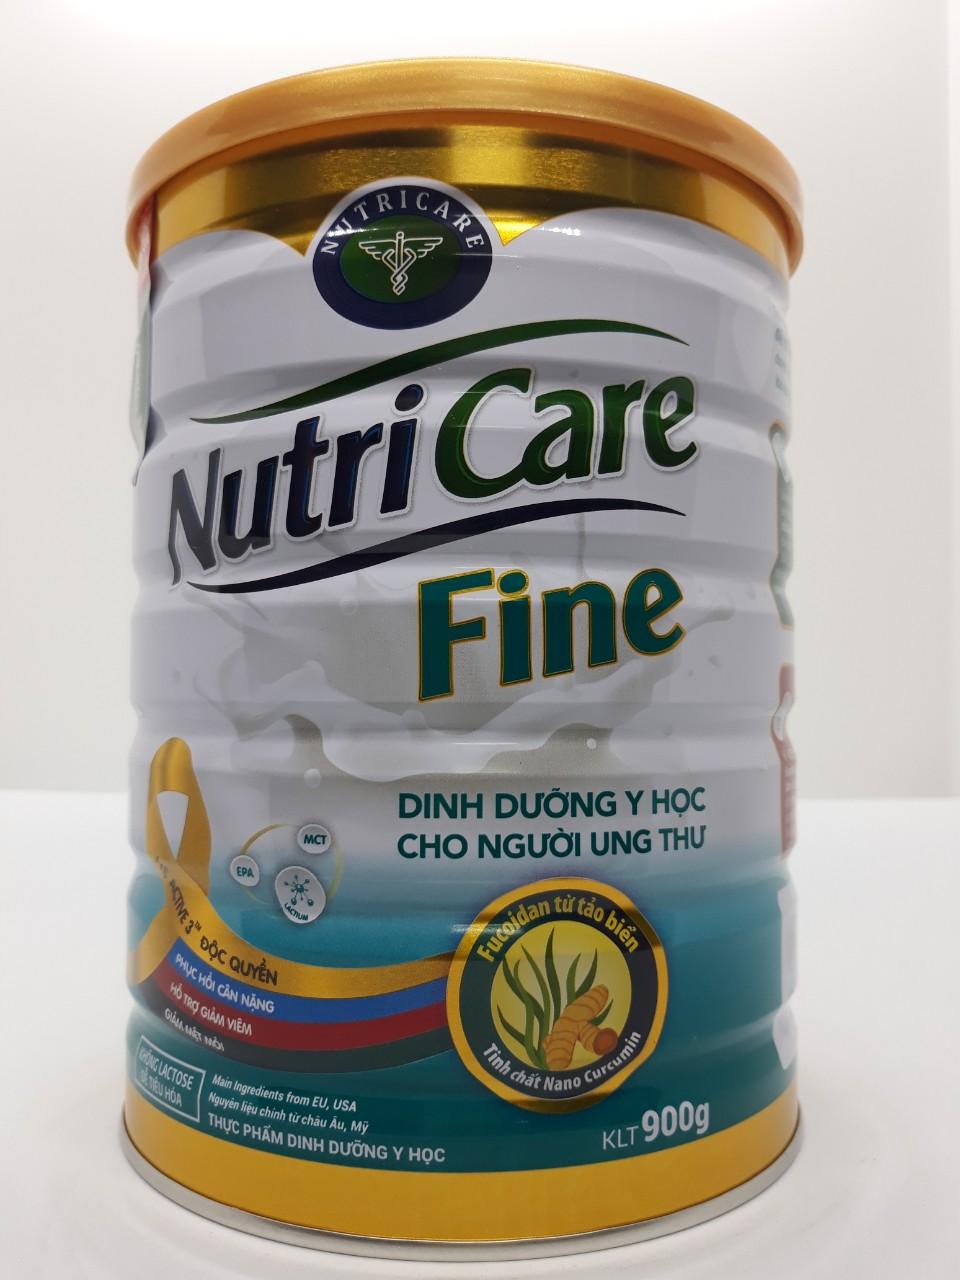 Sữa dinh dưỡng Nutricare Fine hộp 900g